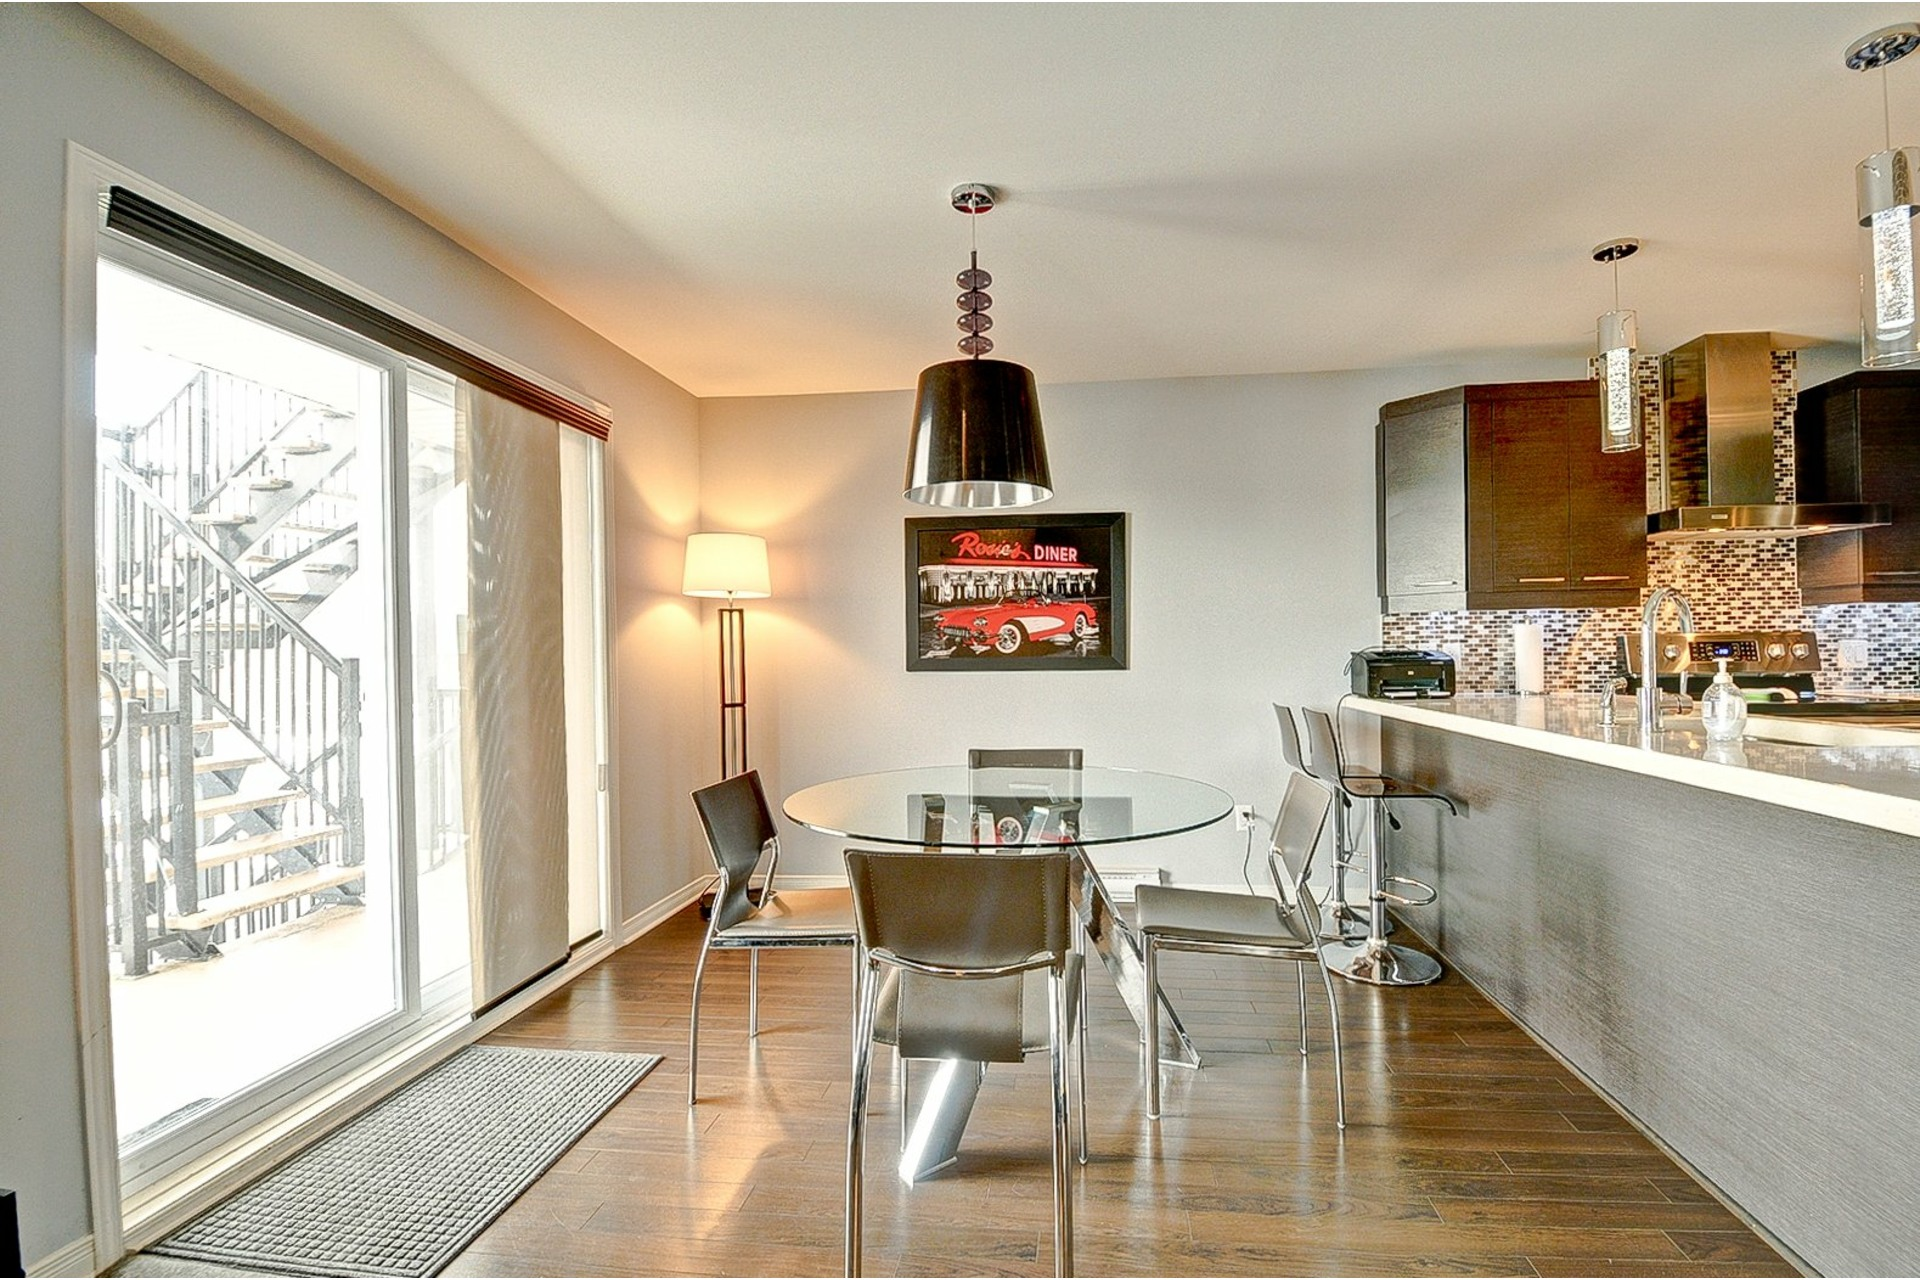 image 3 - Apartment For sale Vaudreuil-Dorion - 7 rooms